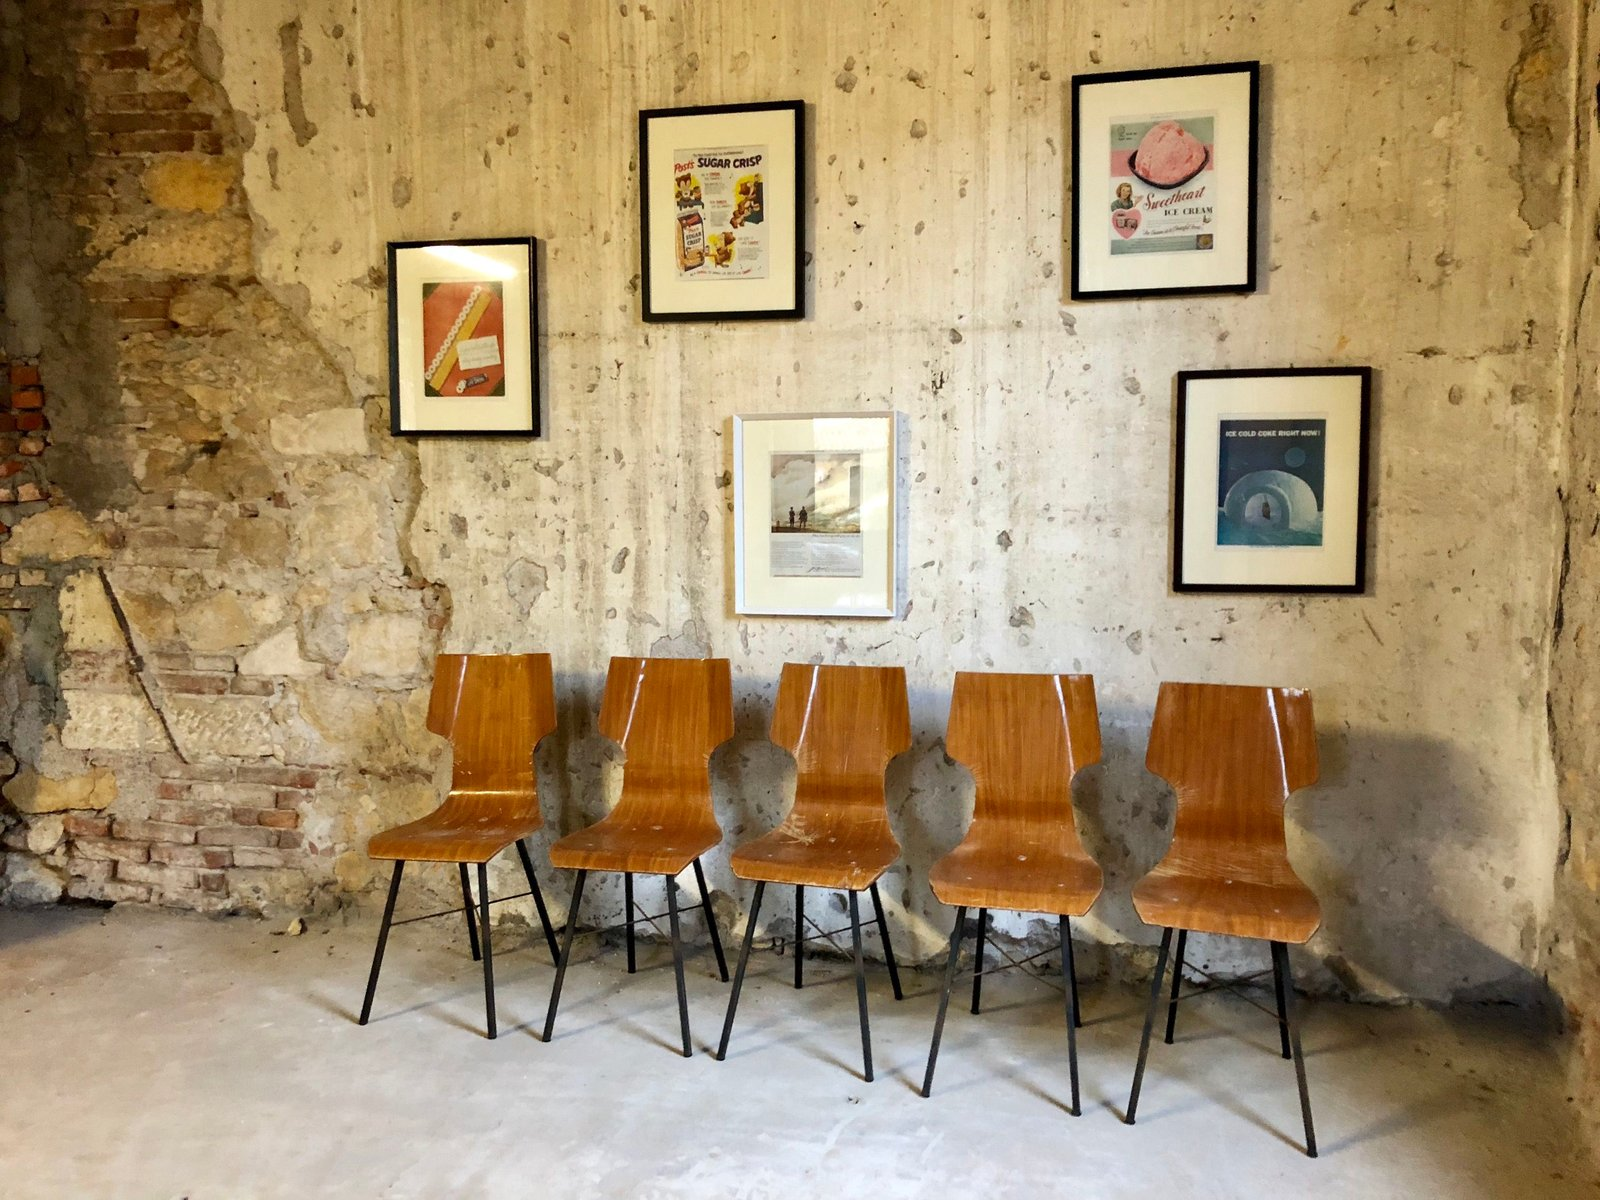 Chaises de salle manger contreplaqu en fer forg italie 1954 set de 5 en vente sur pamono for Salle a manger fer forge